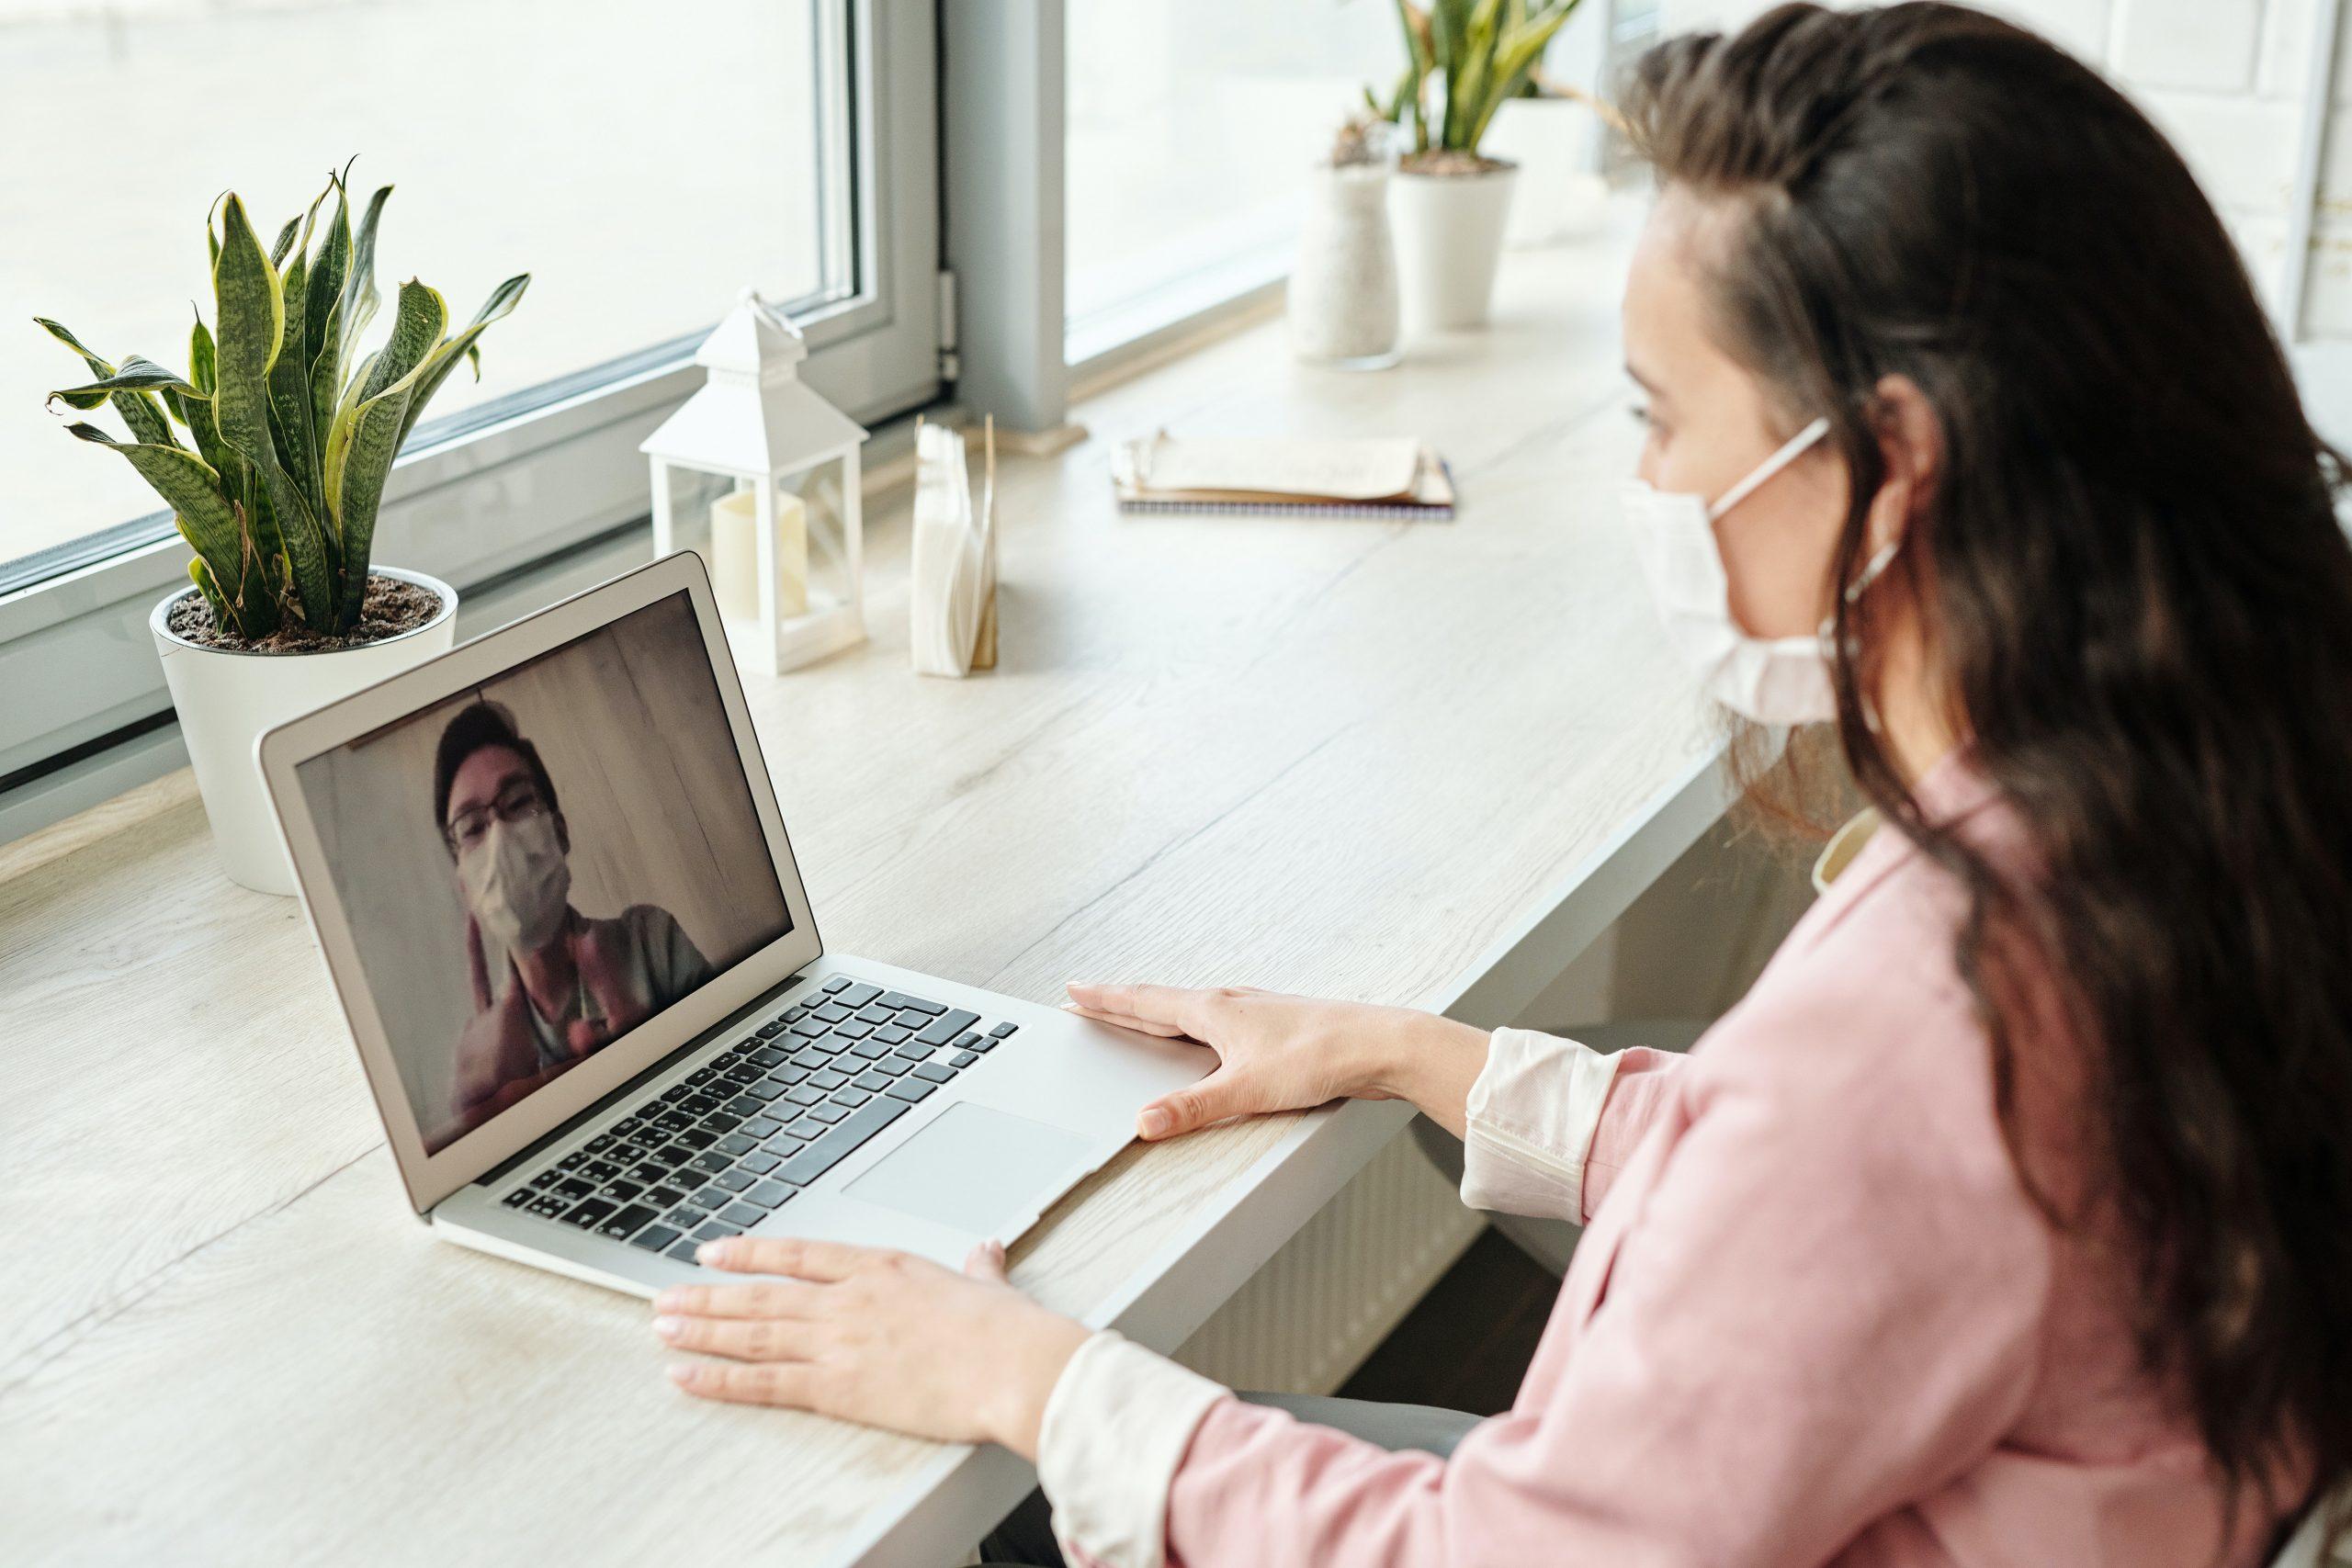 doctor-patient online consultation